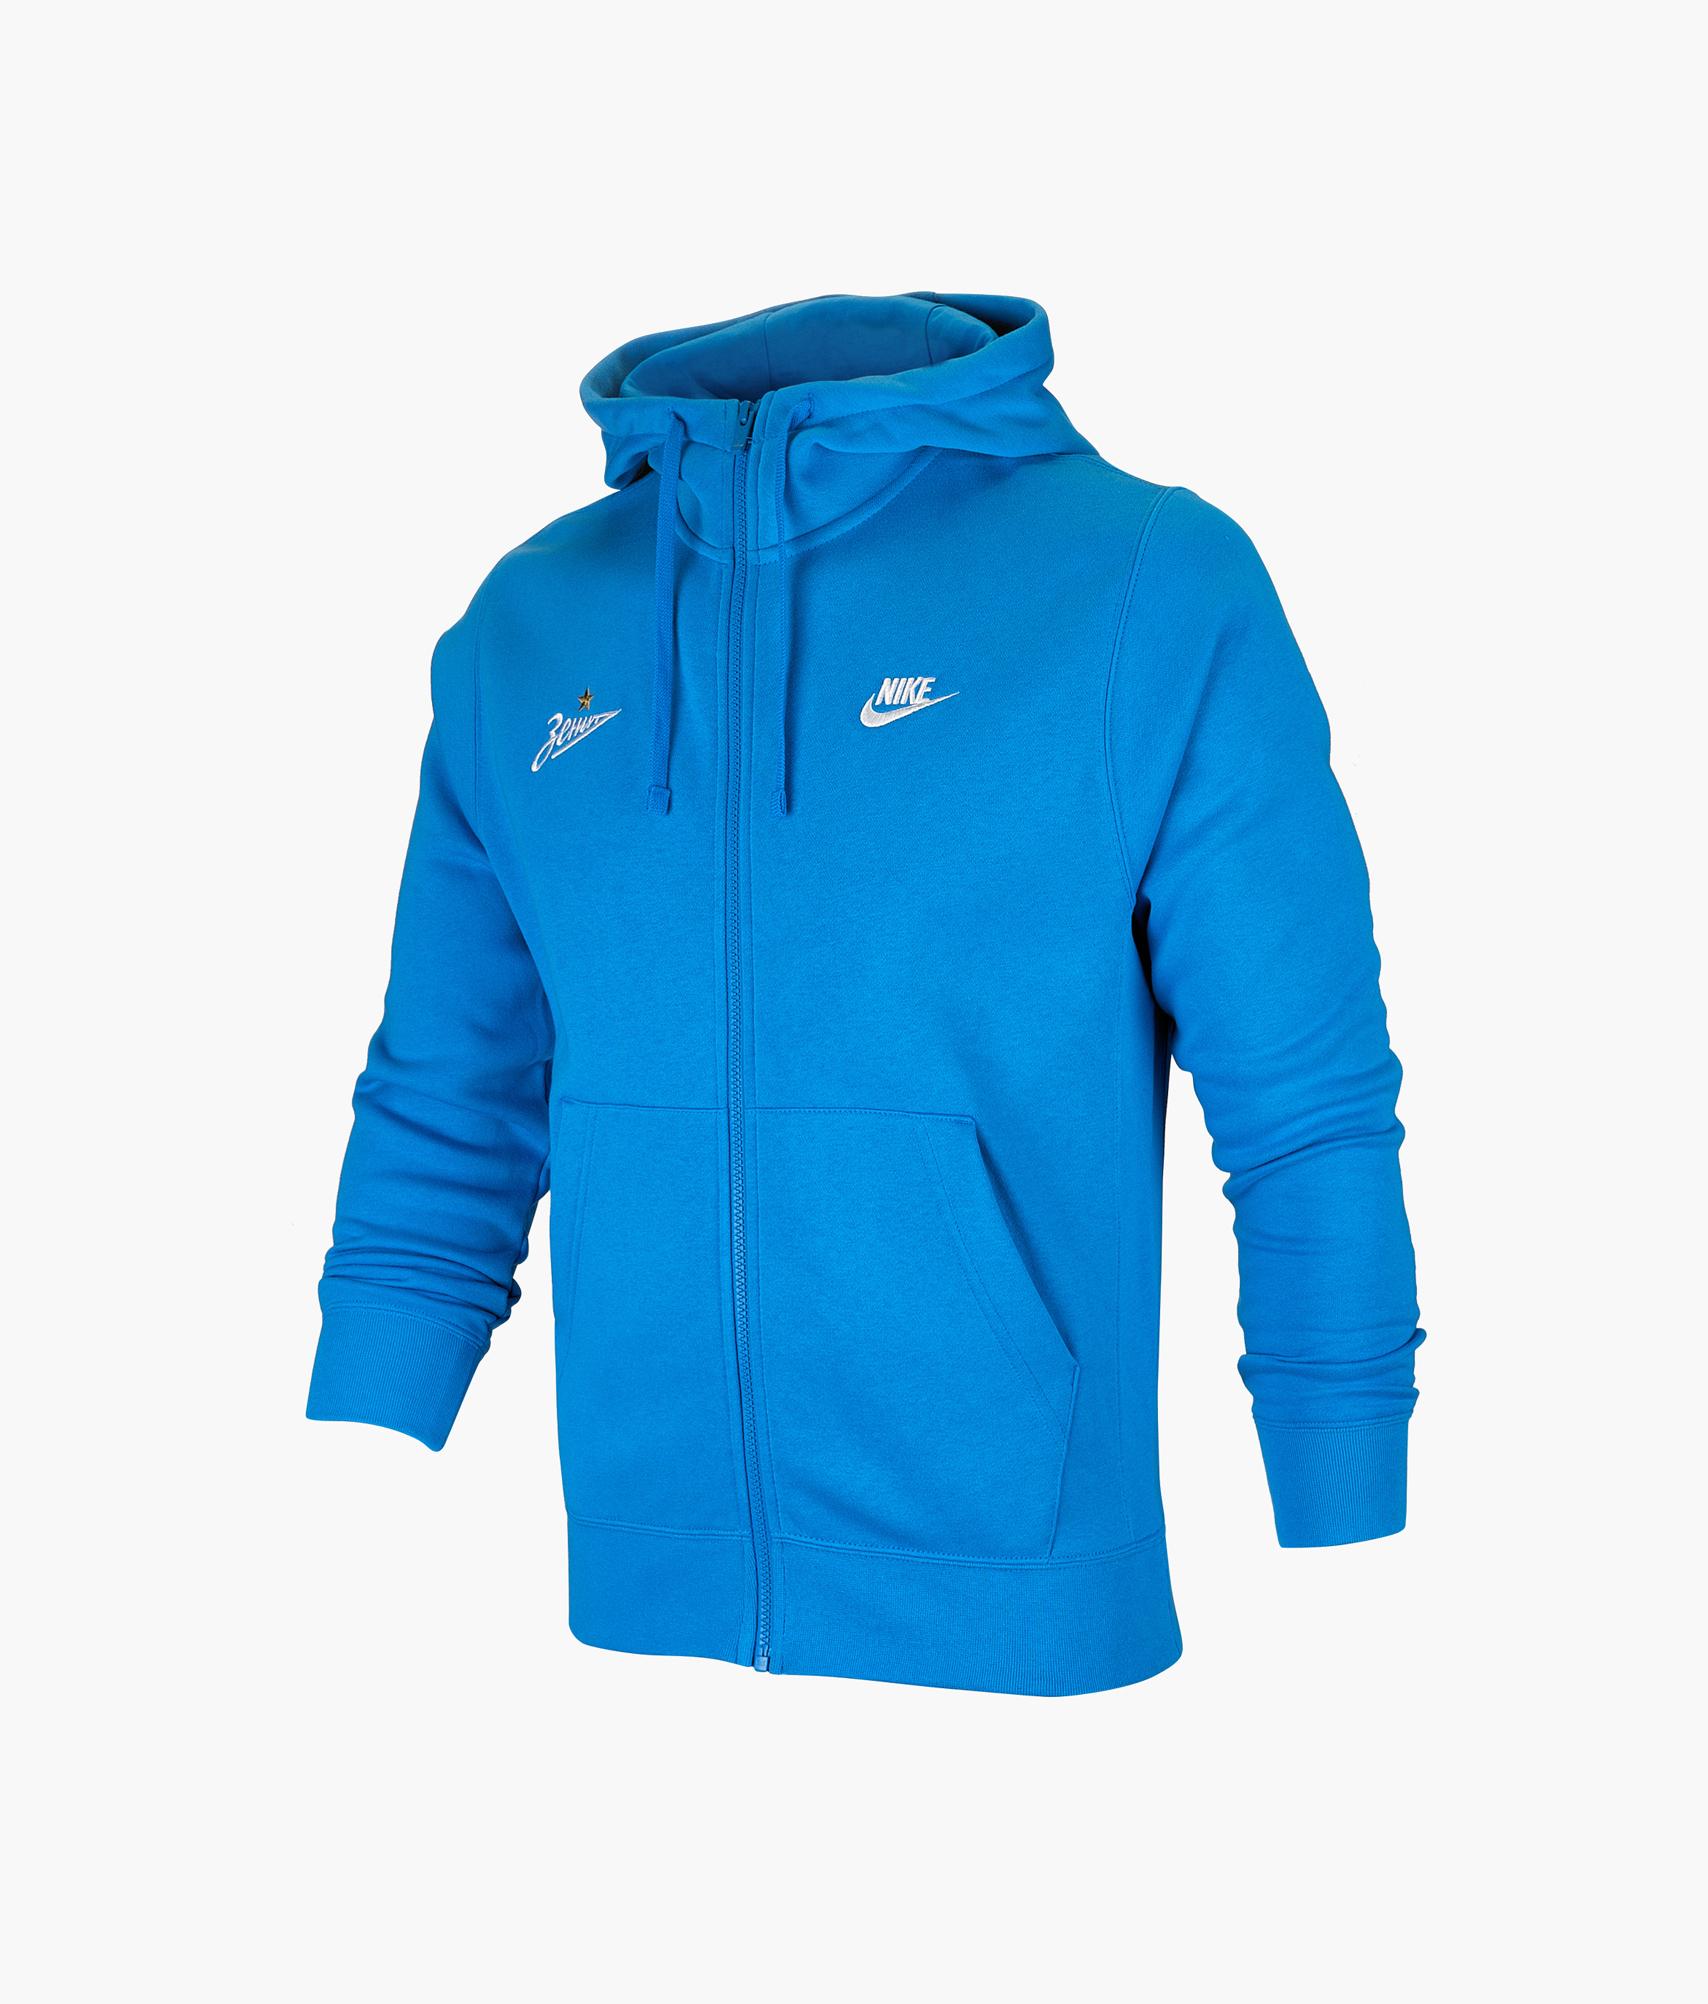 цена на Толстовка Nike Nike Цвет-Синий